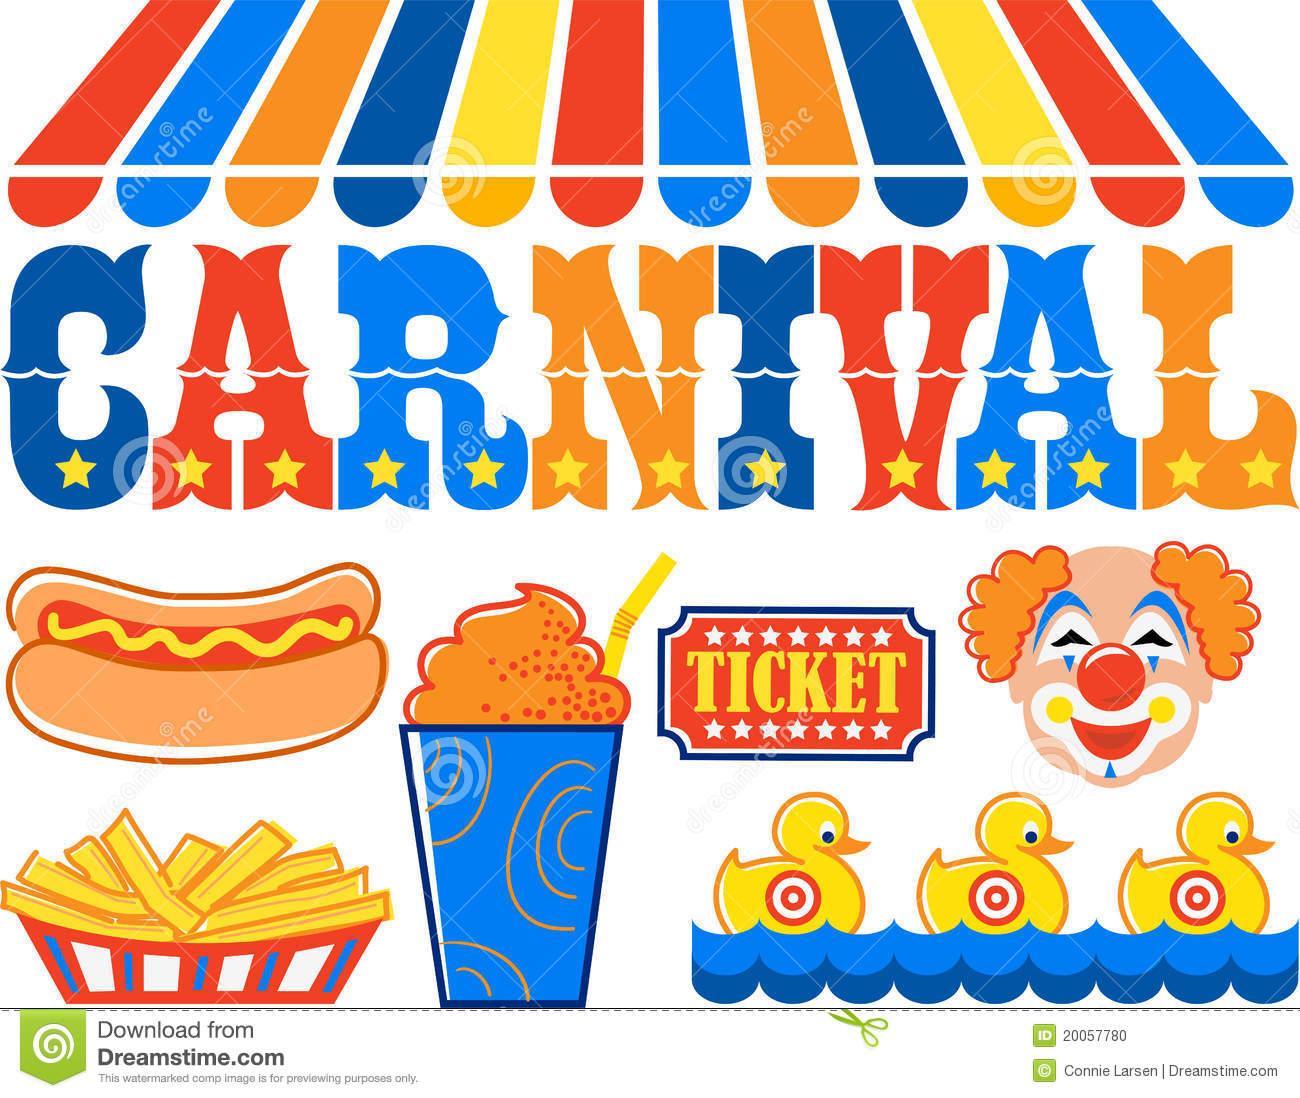 Headline Illustration Of The Word Carnival With Hot Dog Fries Slushy